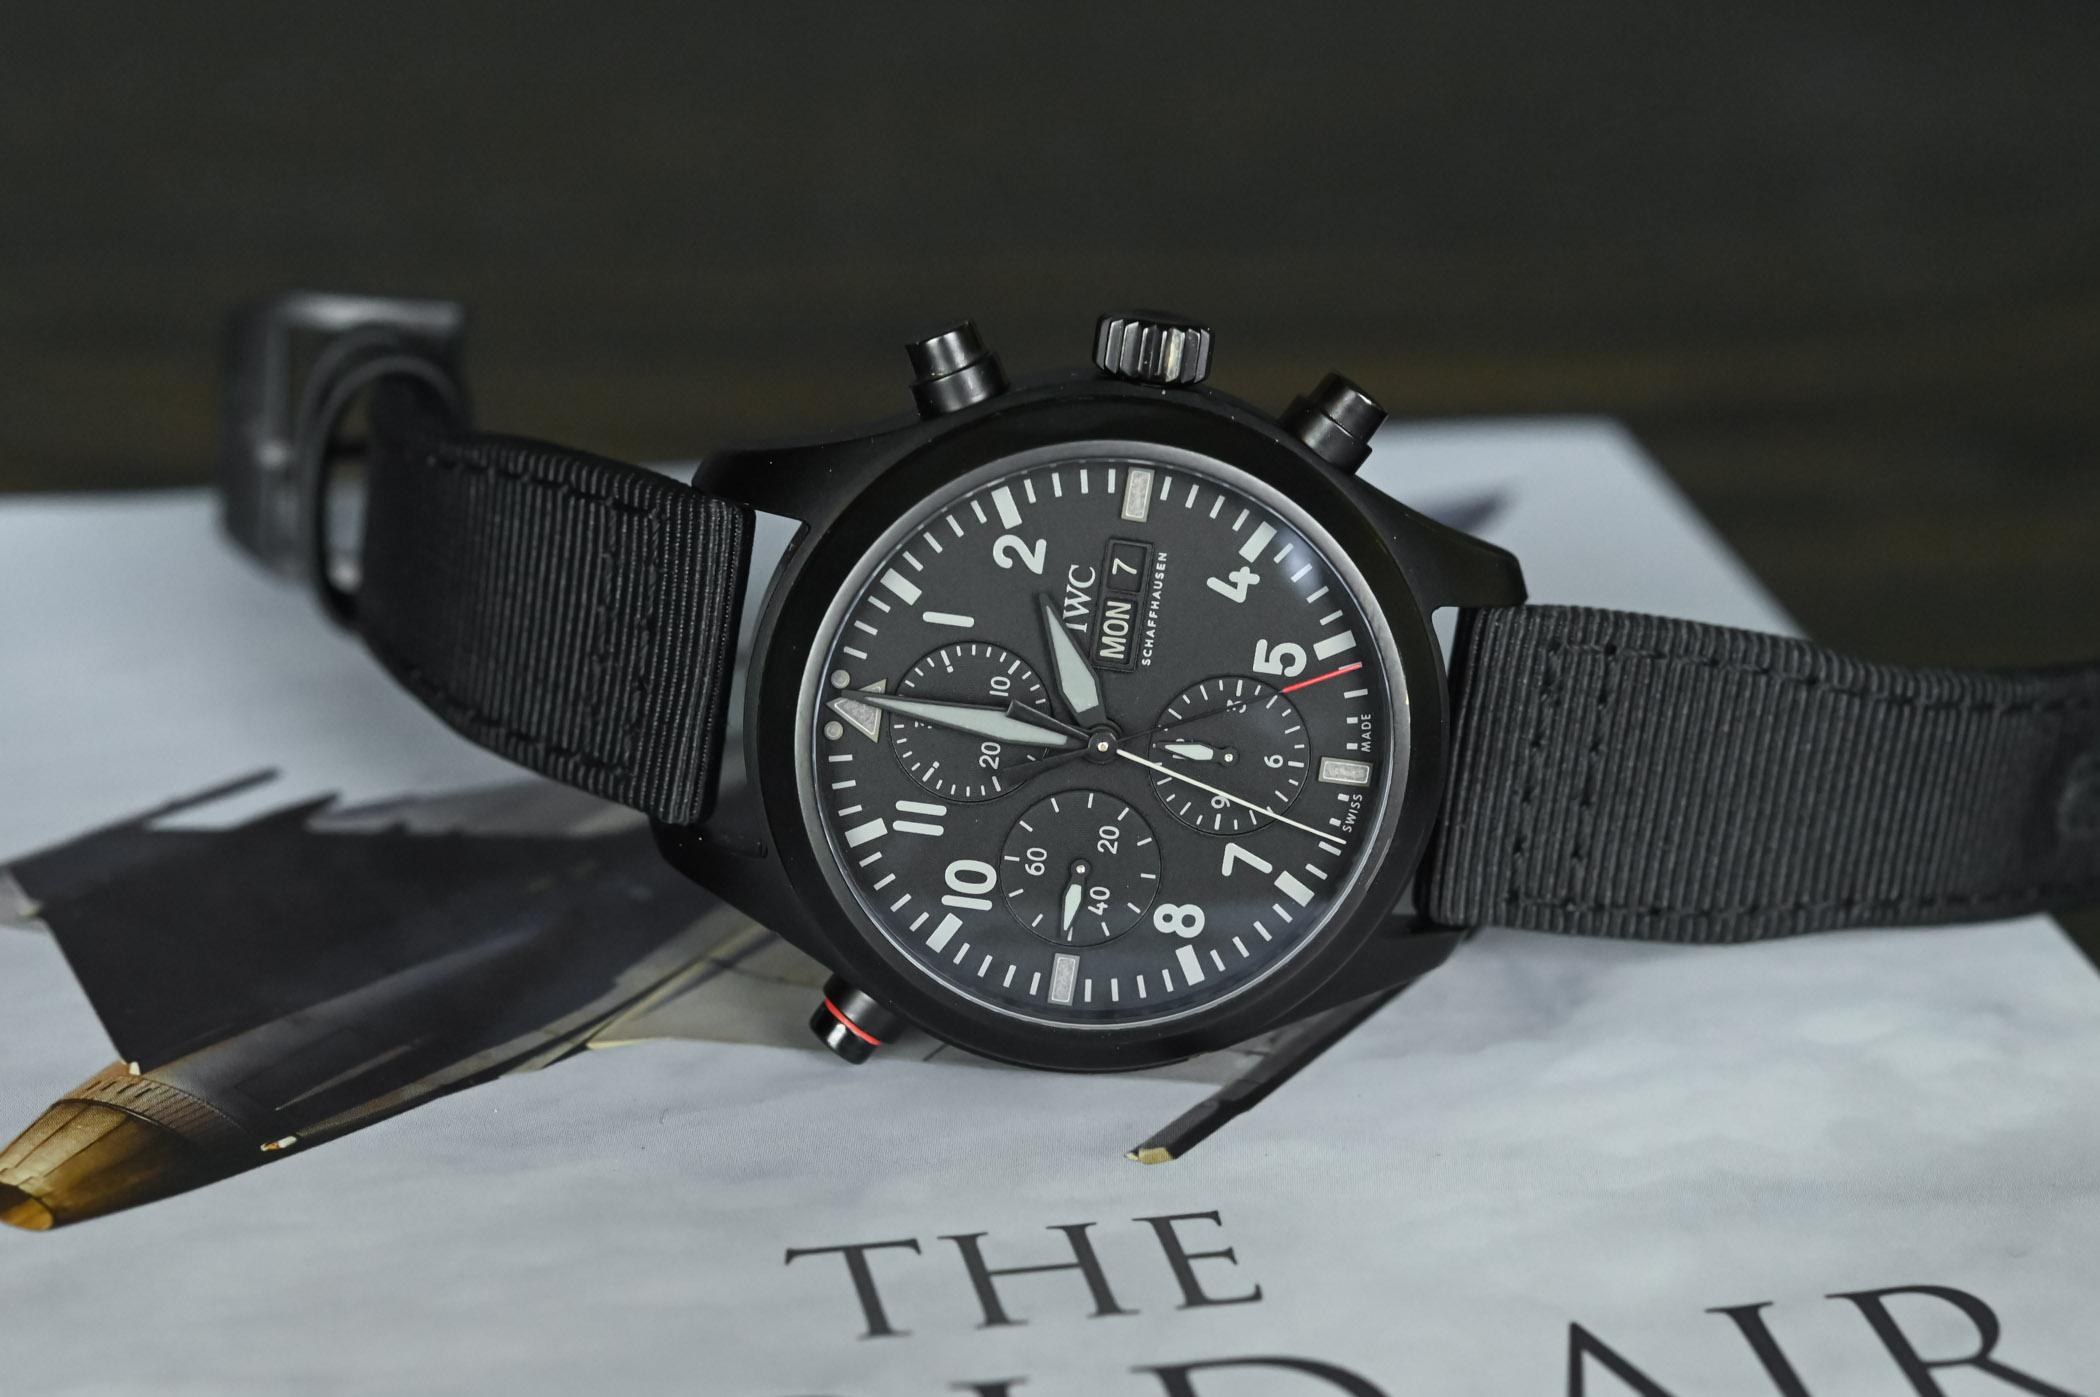 IWC Pilots Watch Double Chronograph TOP GUN Ceratanium IW371815 - SIHH 2019 - 15